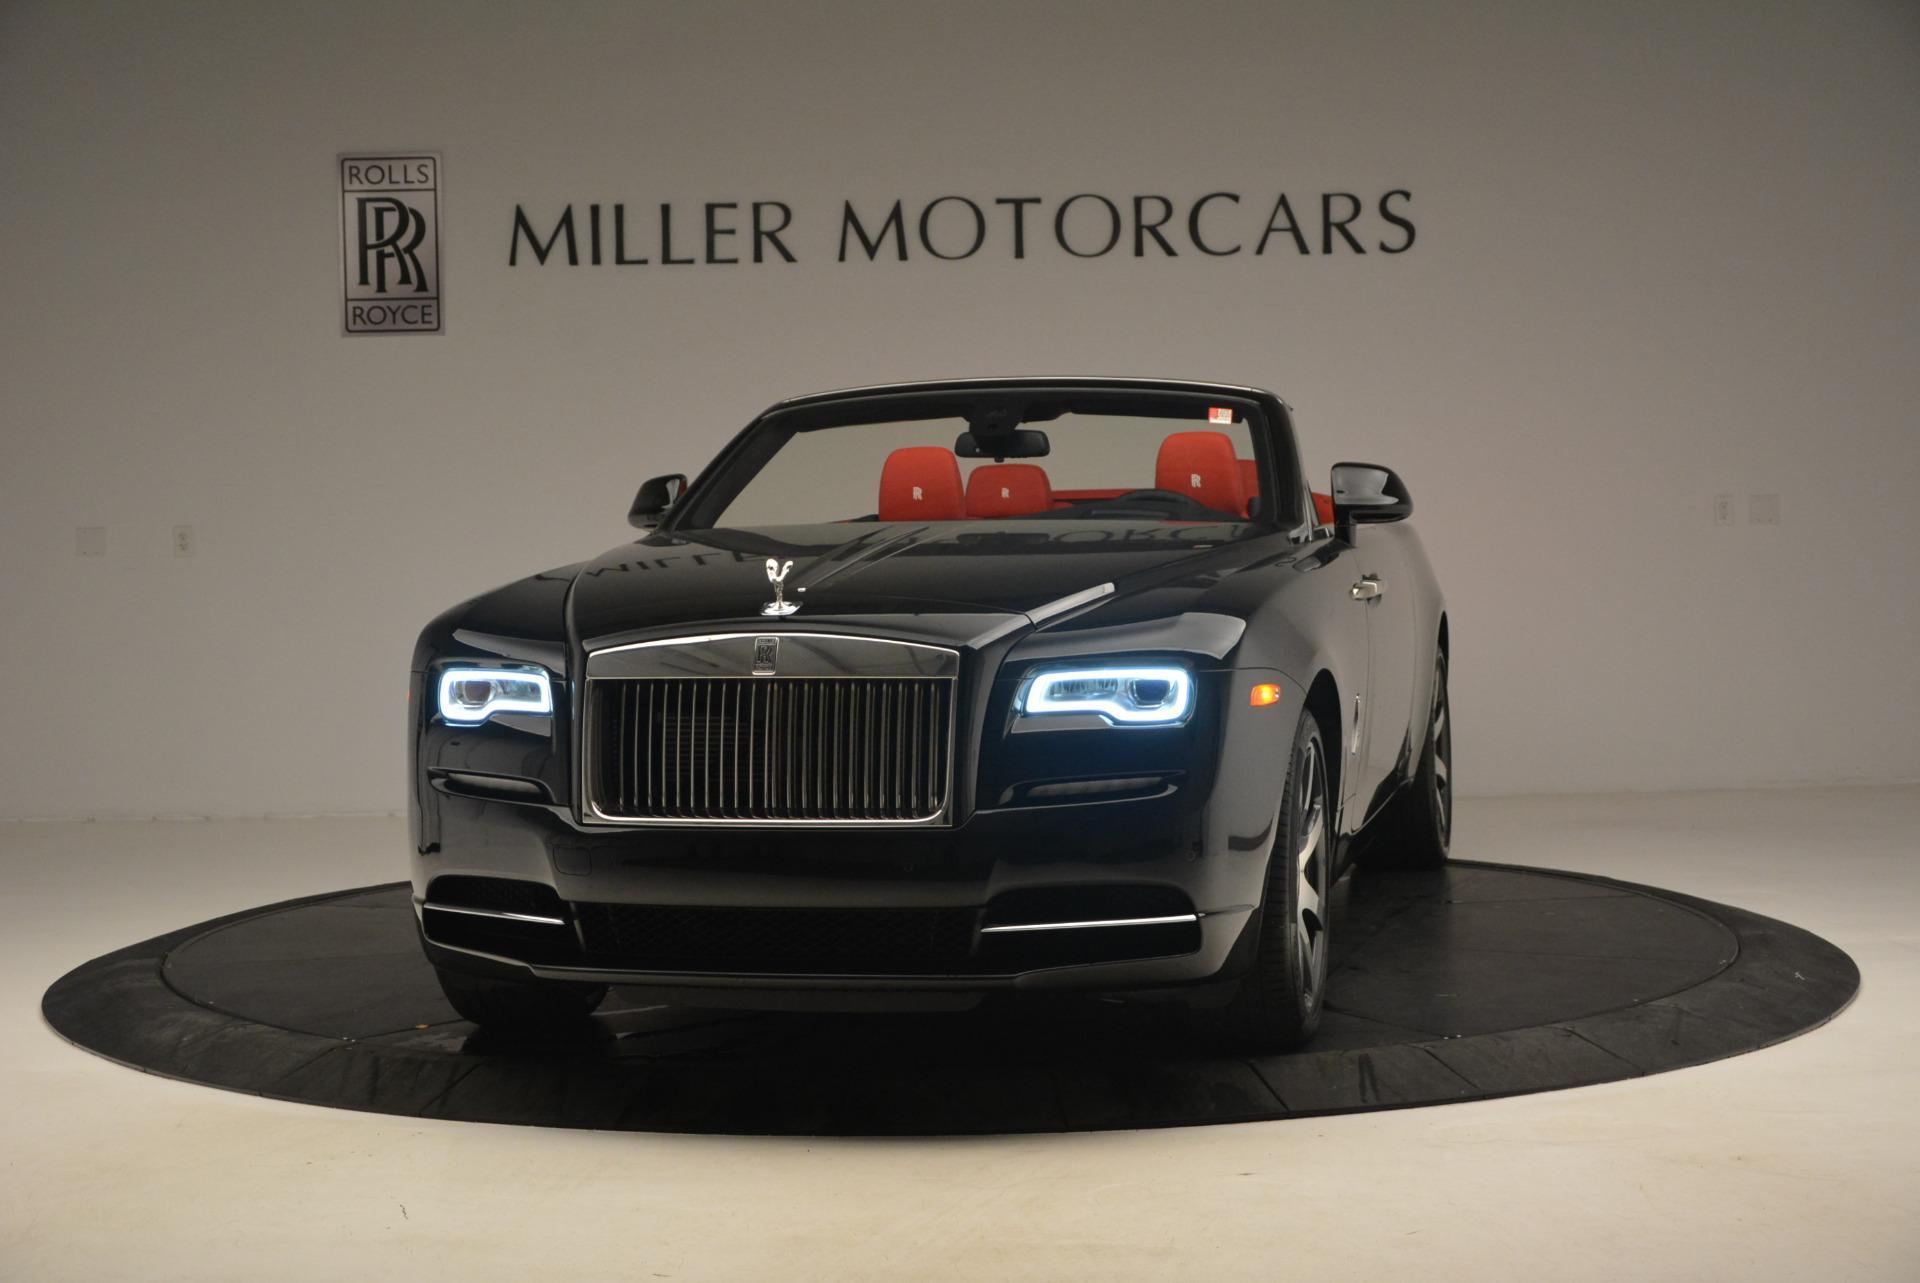 New 2017 Rolls-Royce Dawn for sale Sold at Maserati of Westport in Westport CT 06880 1